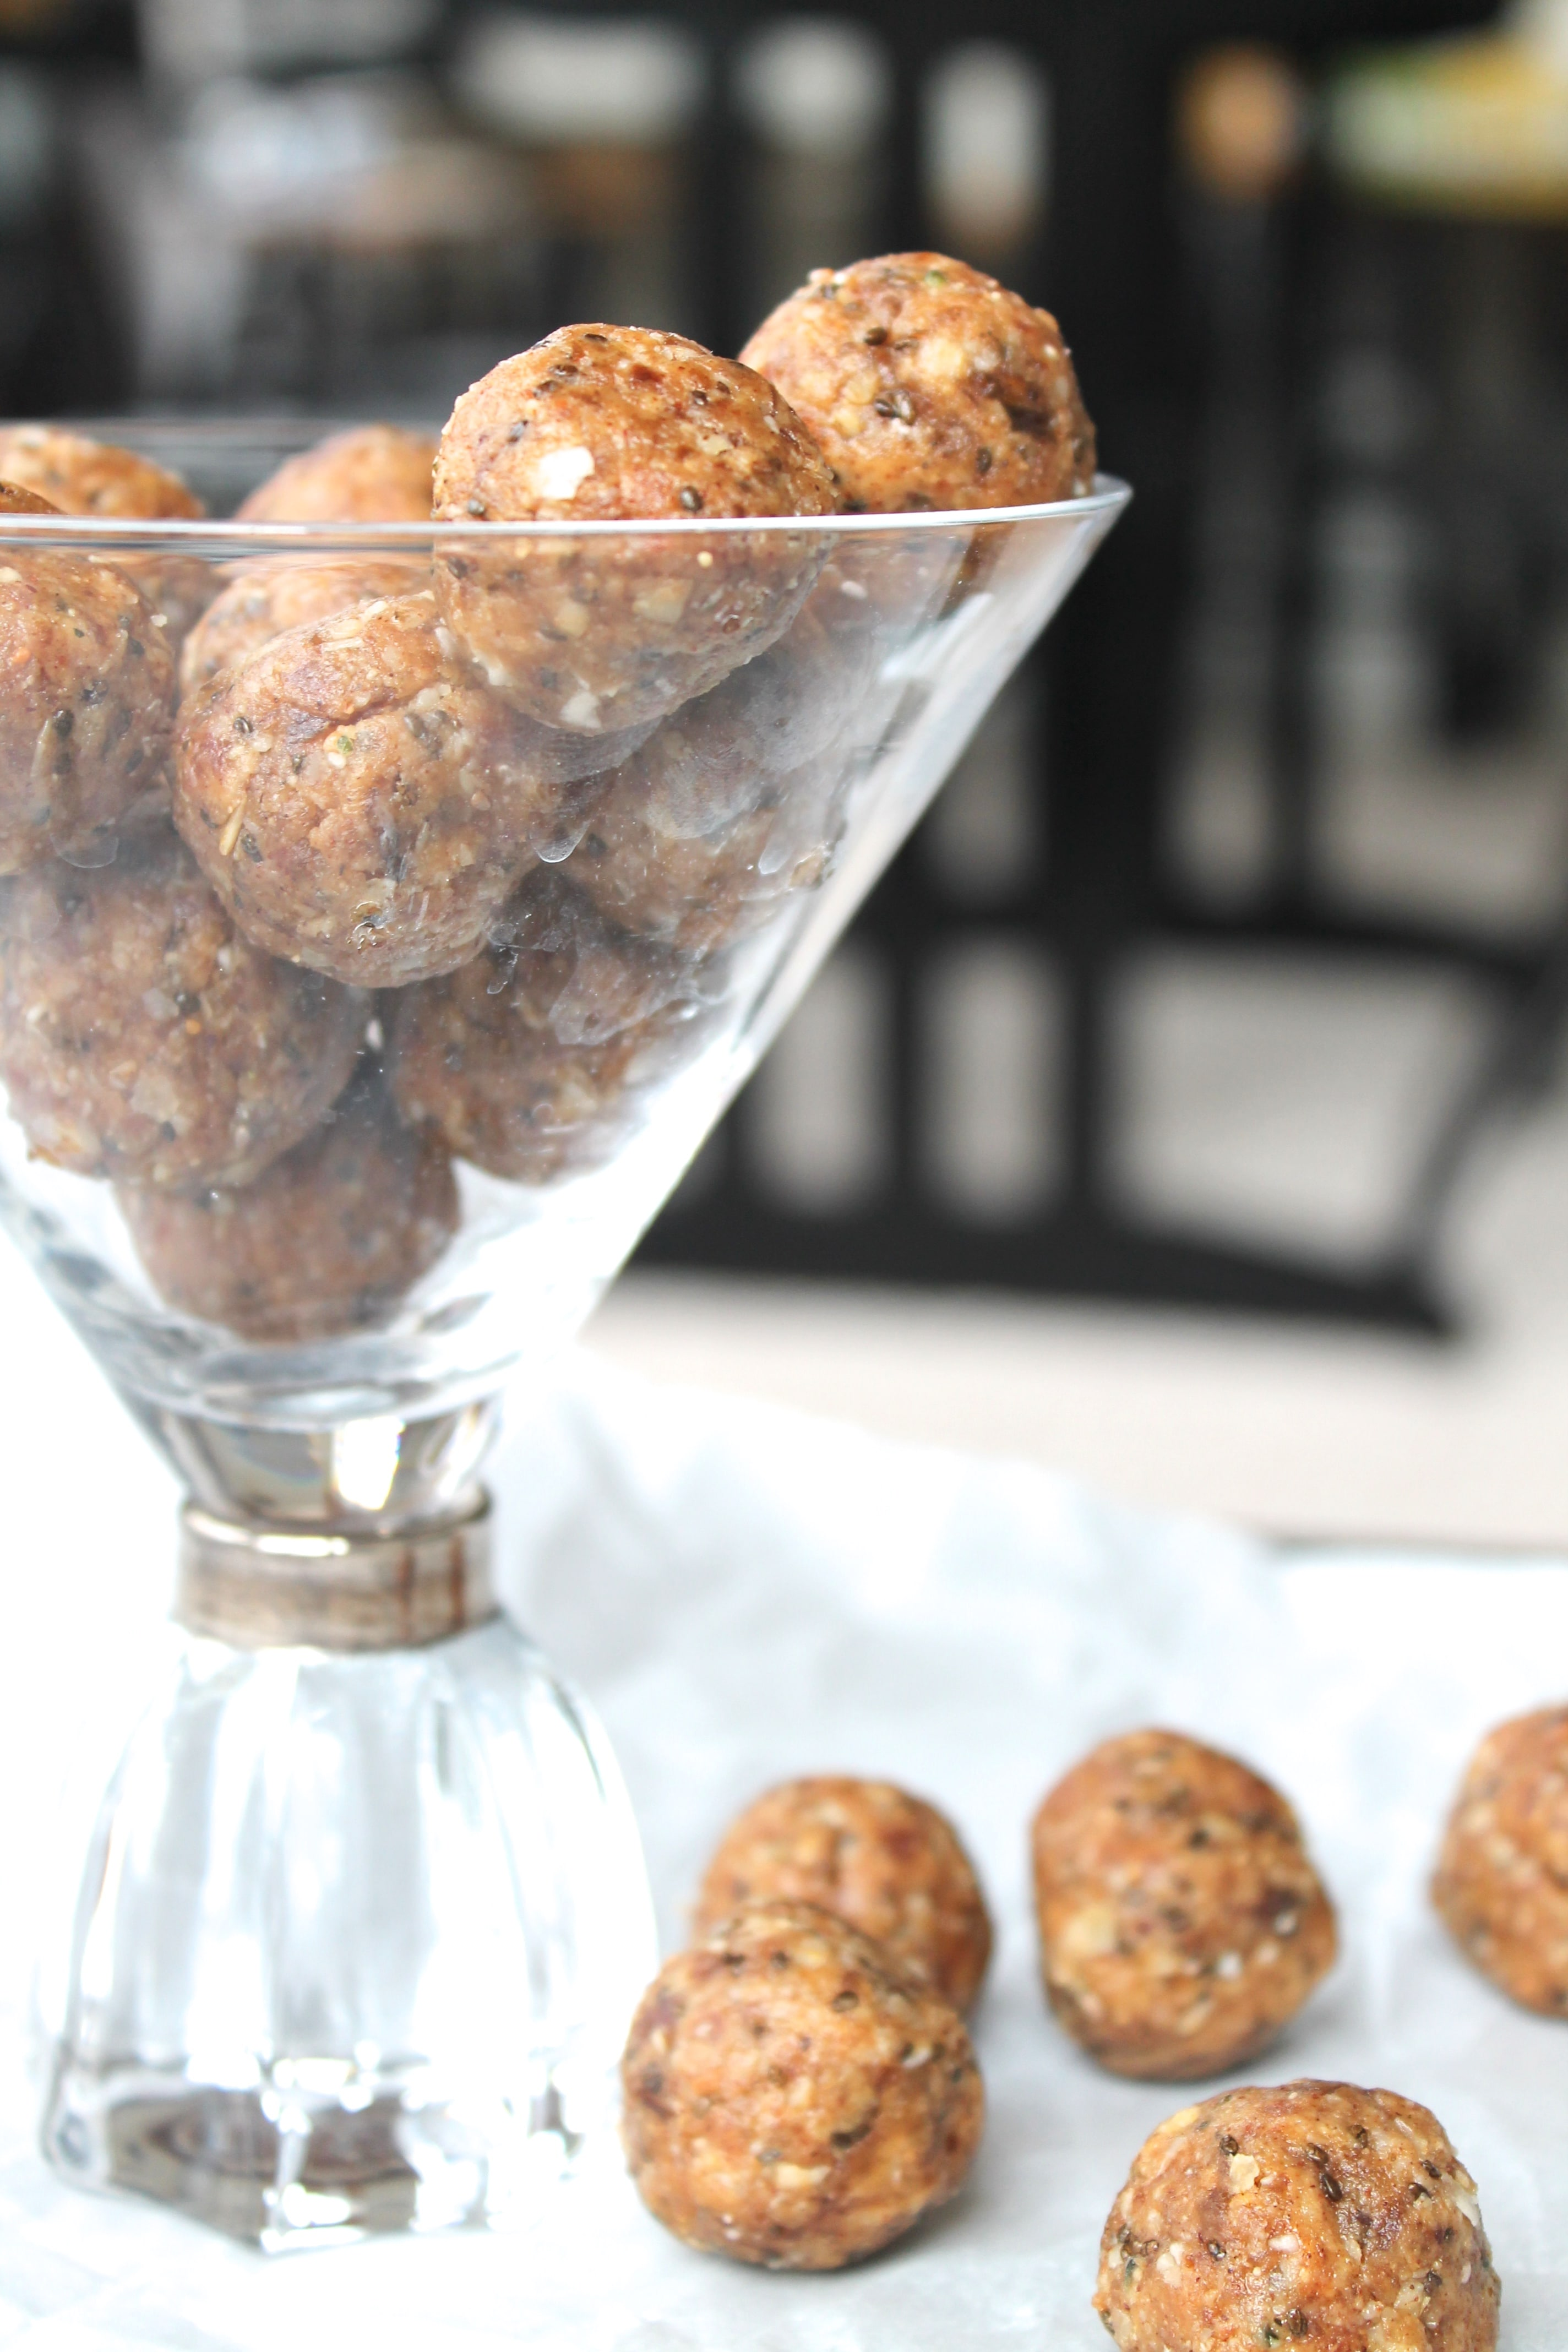 Almond Date Power Bites